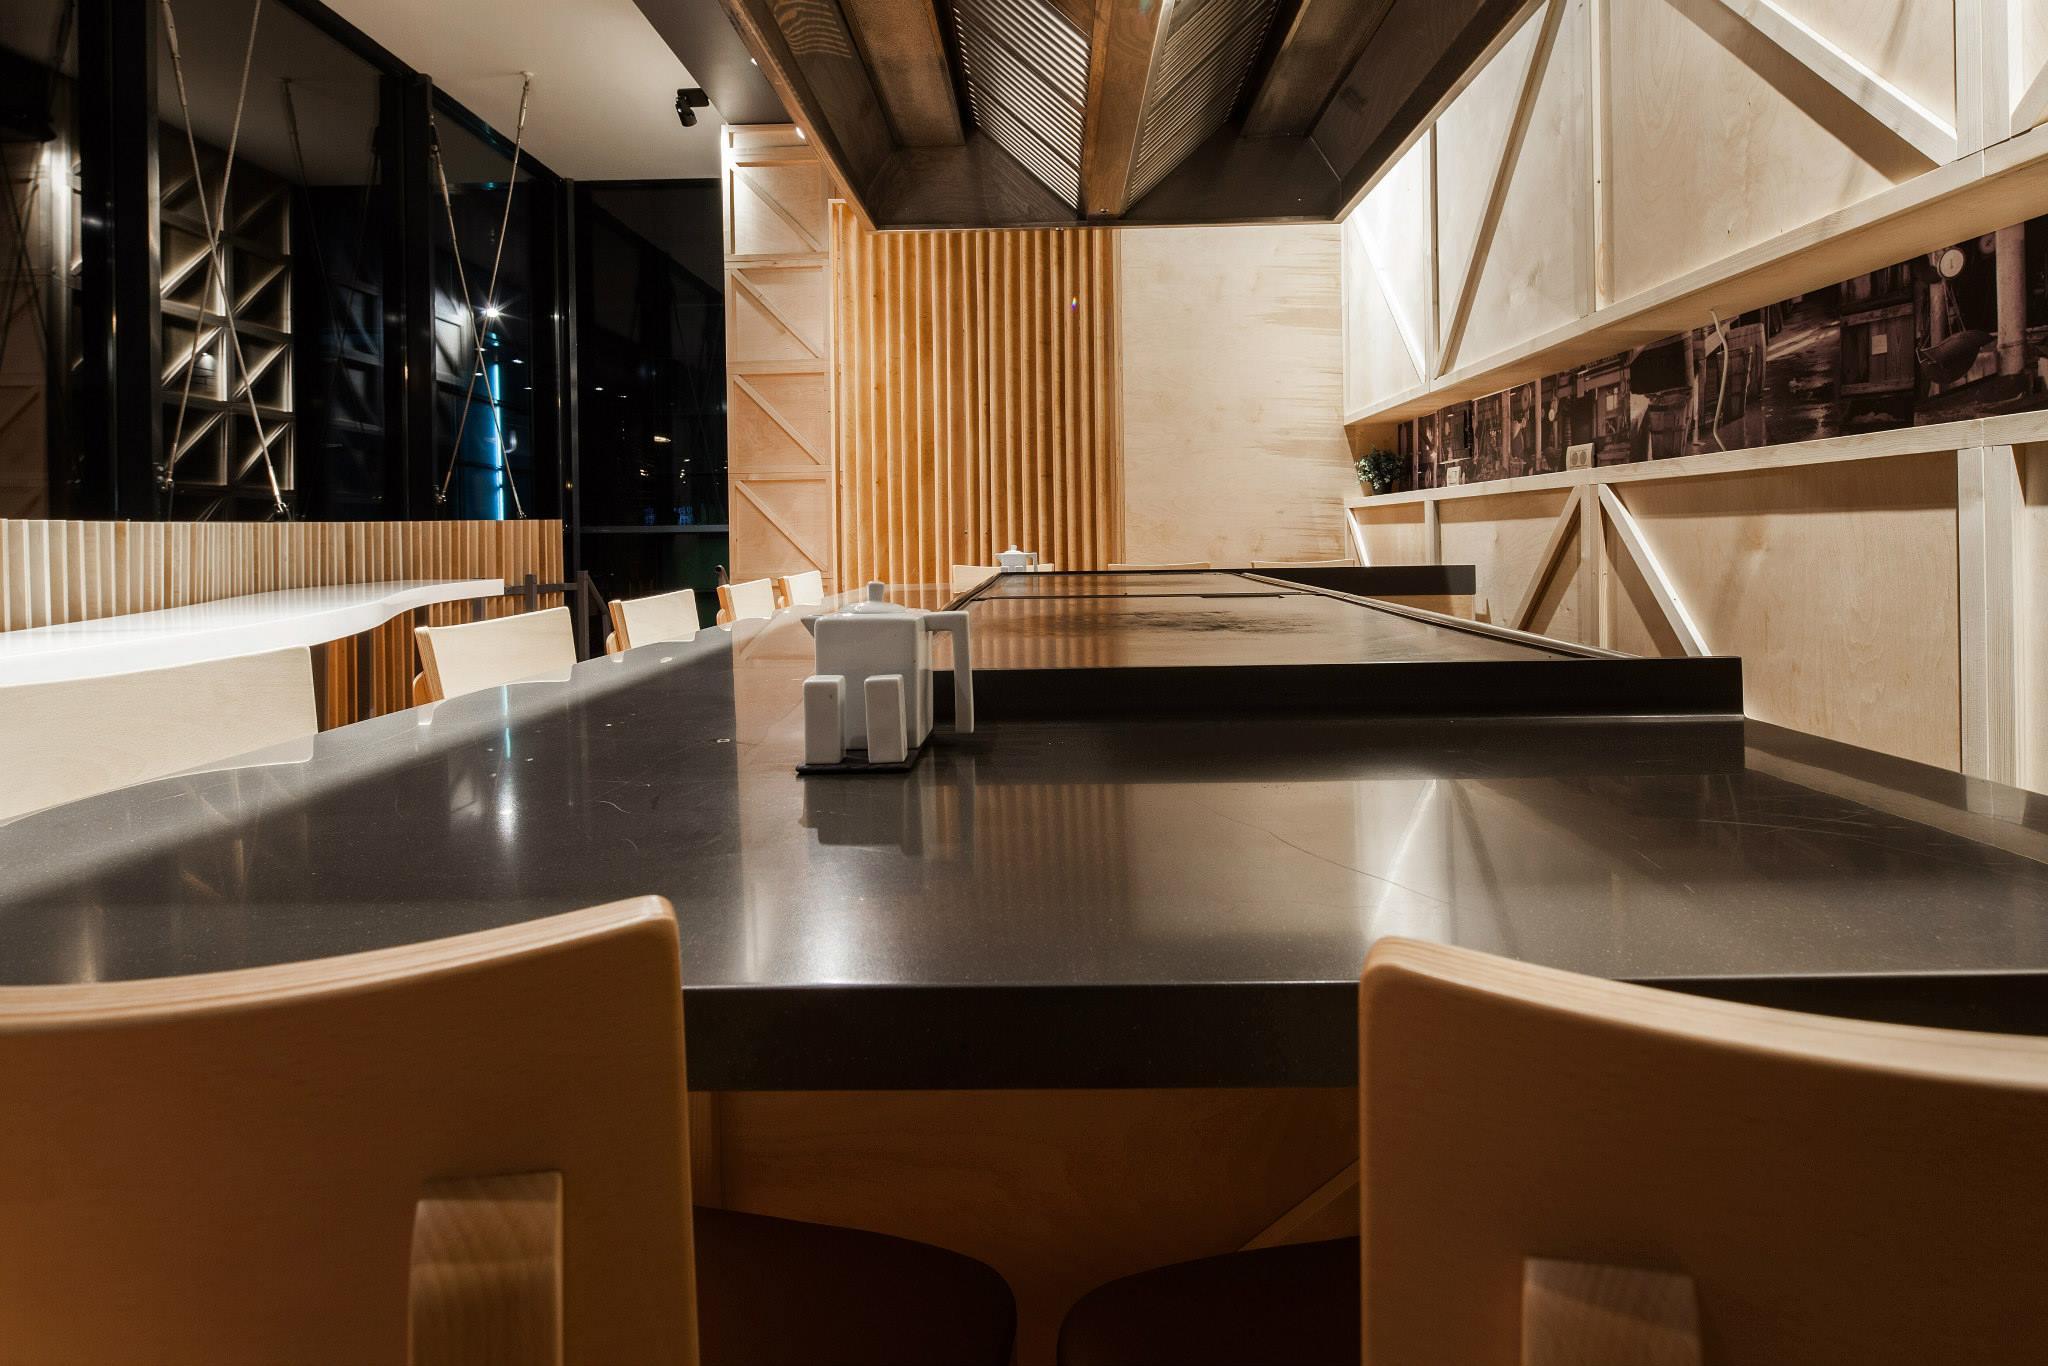 YOSHI-Sushi-Teppanyaki-Trivenus-Ama-Design-22